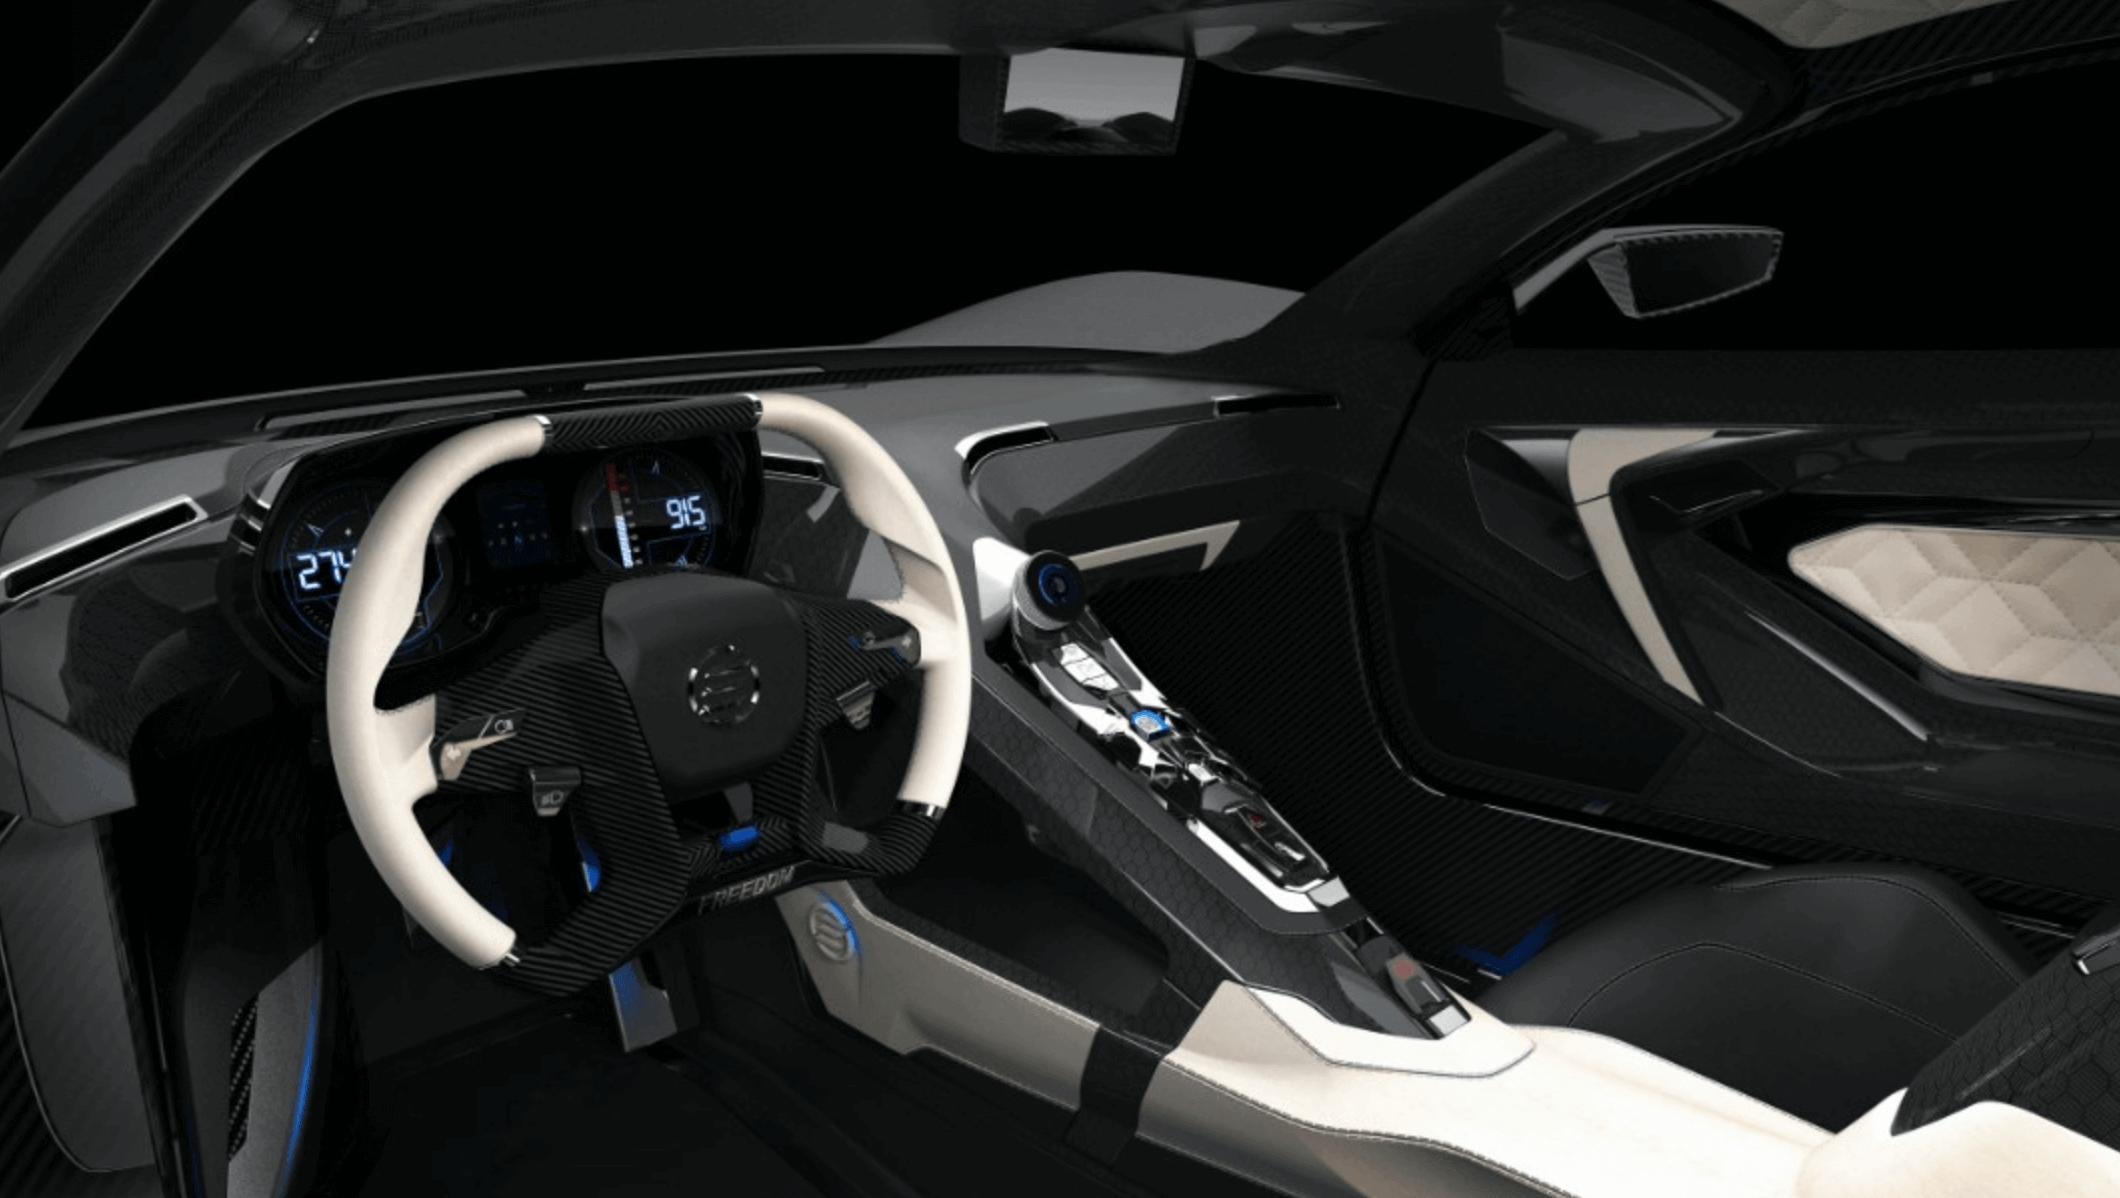 elation hypercars cascadia motion araba iç tasarım